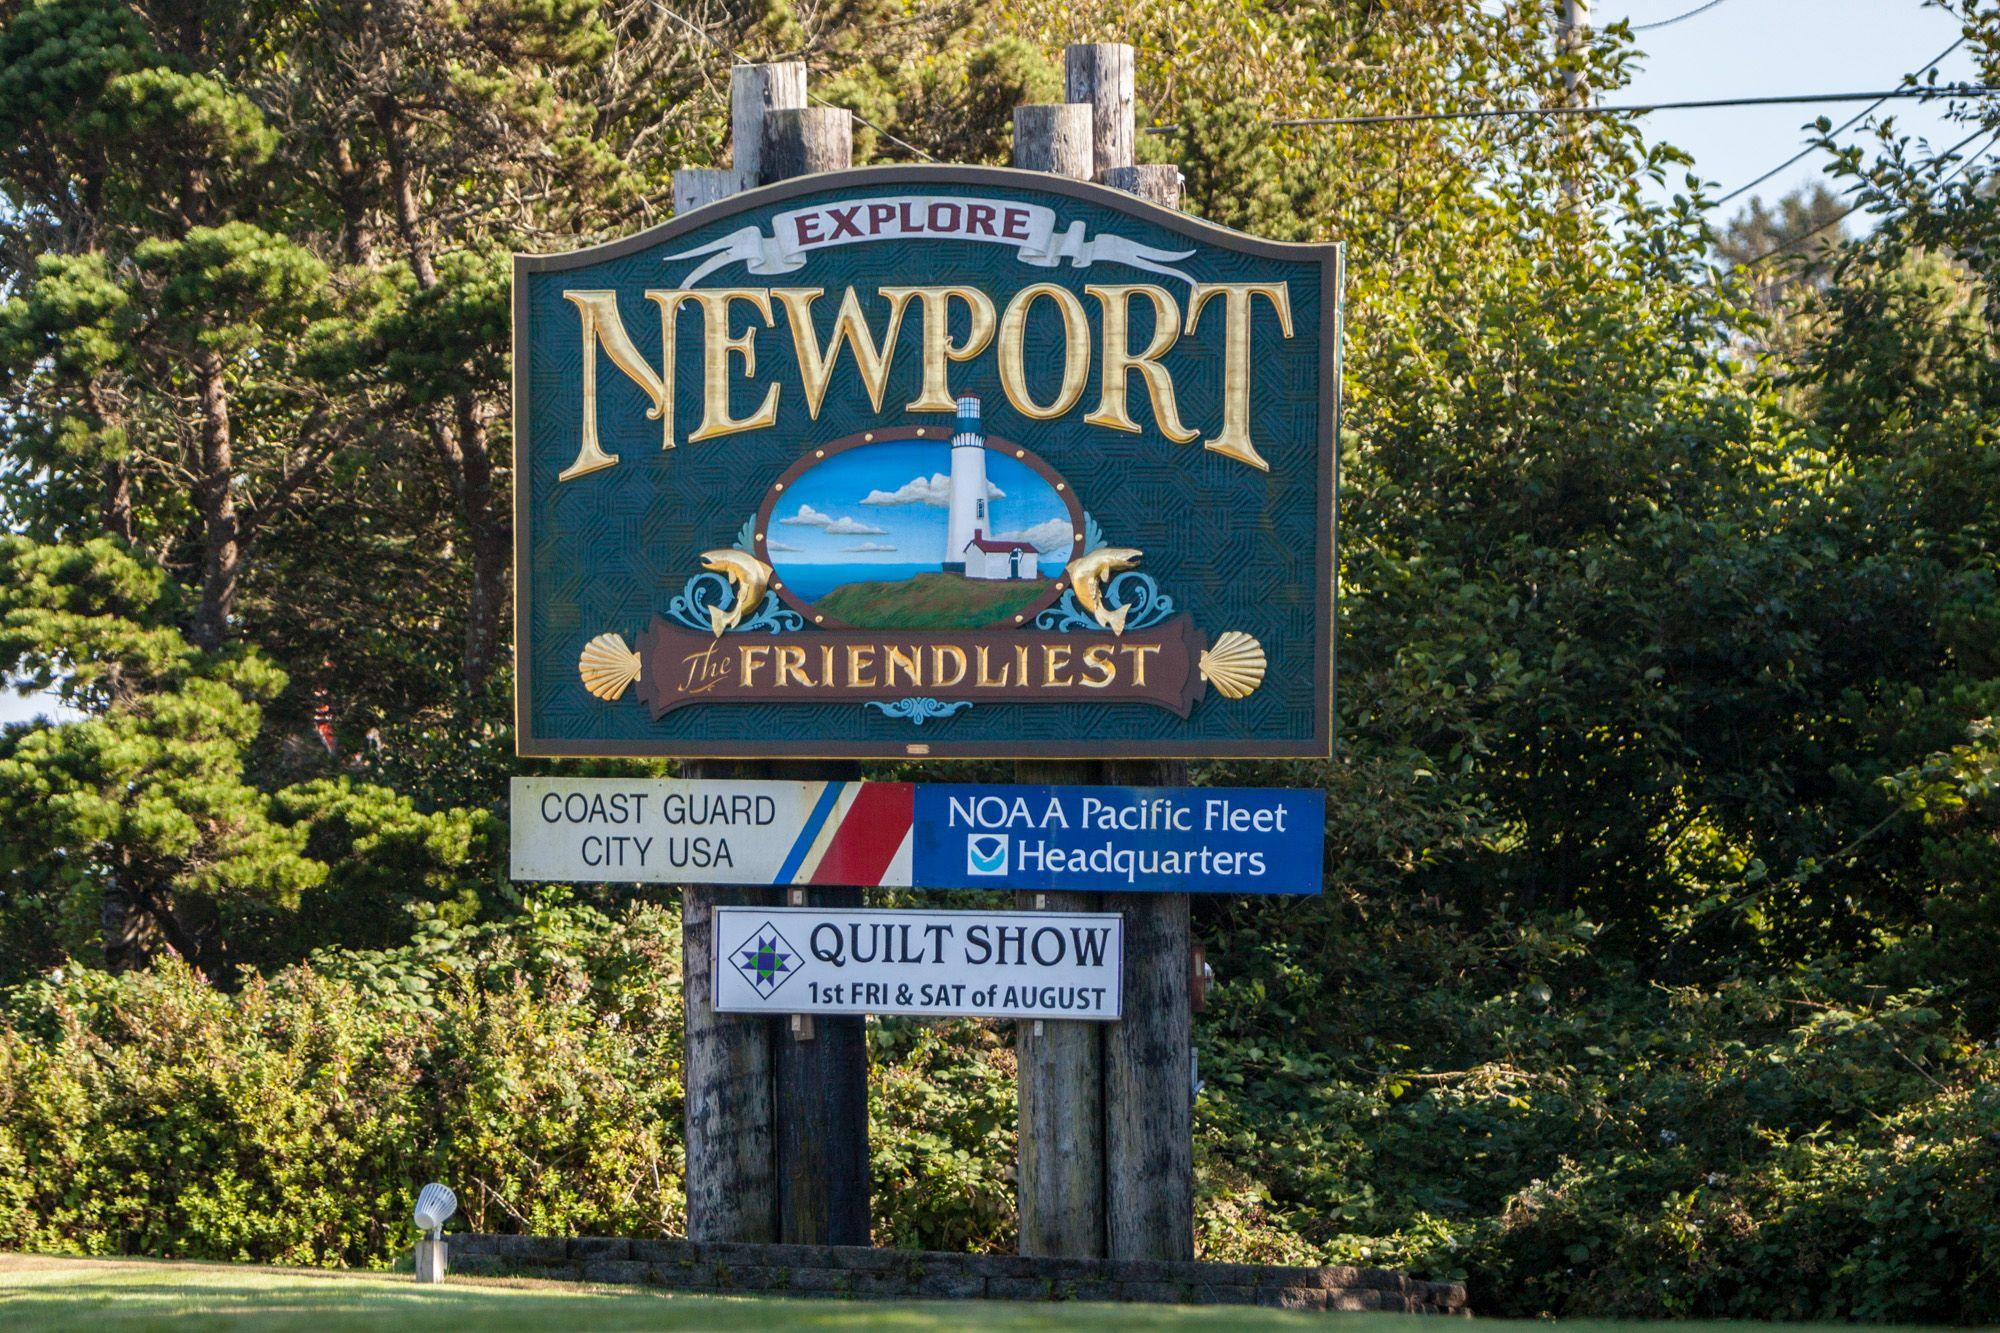 A Weekend Getaway to Newport, Oregon